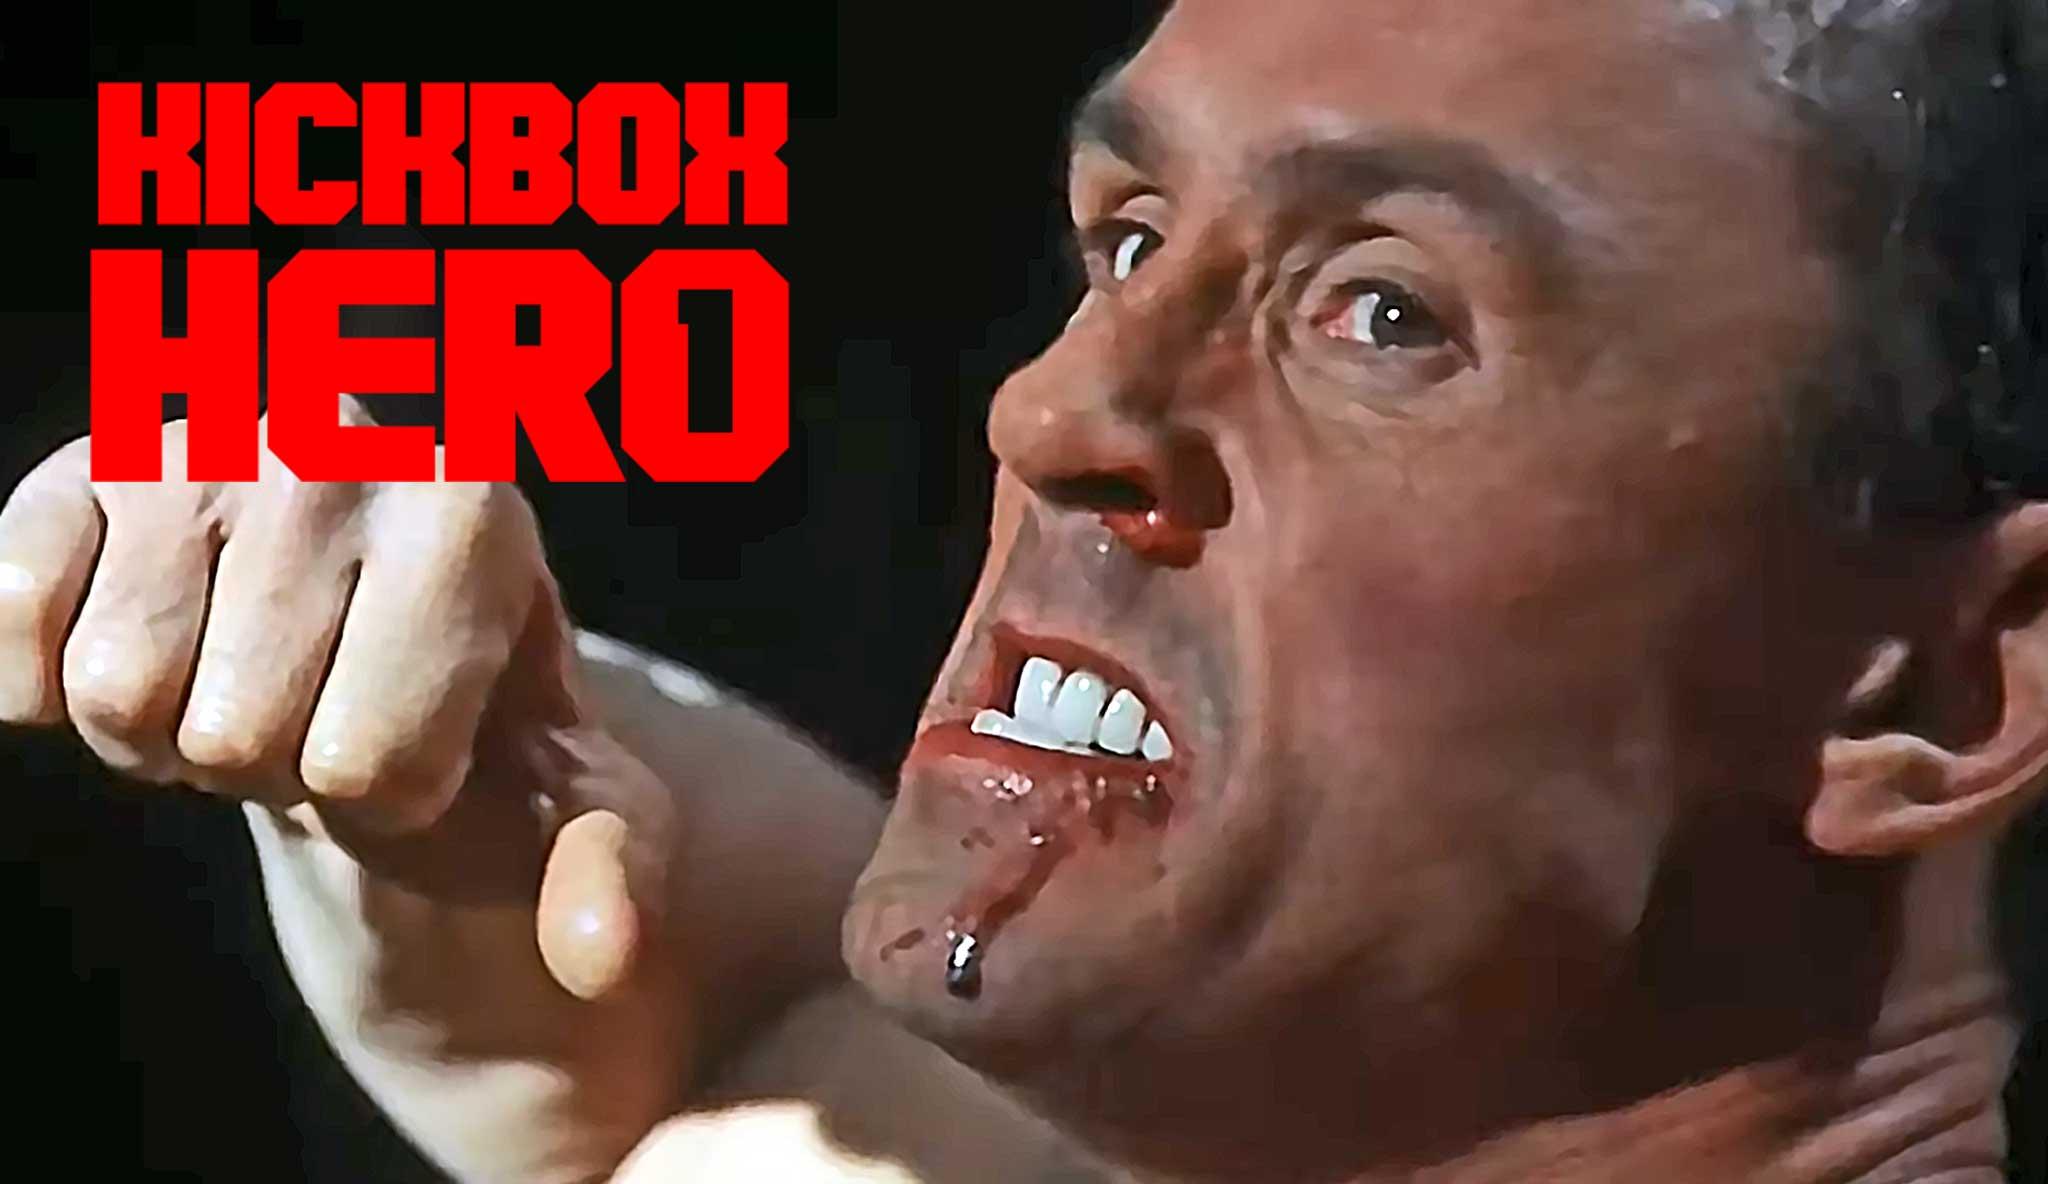 kickbox-hero-1\header.jpg